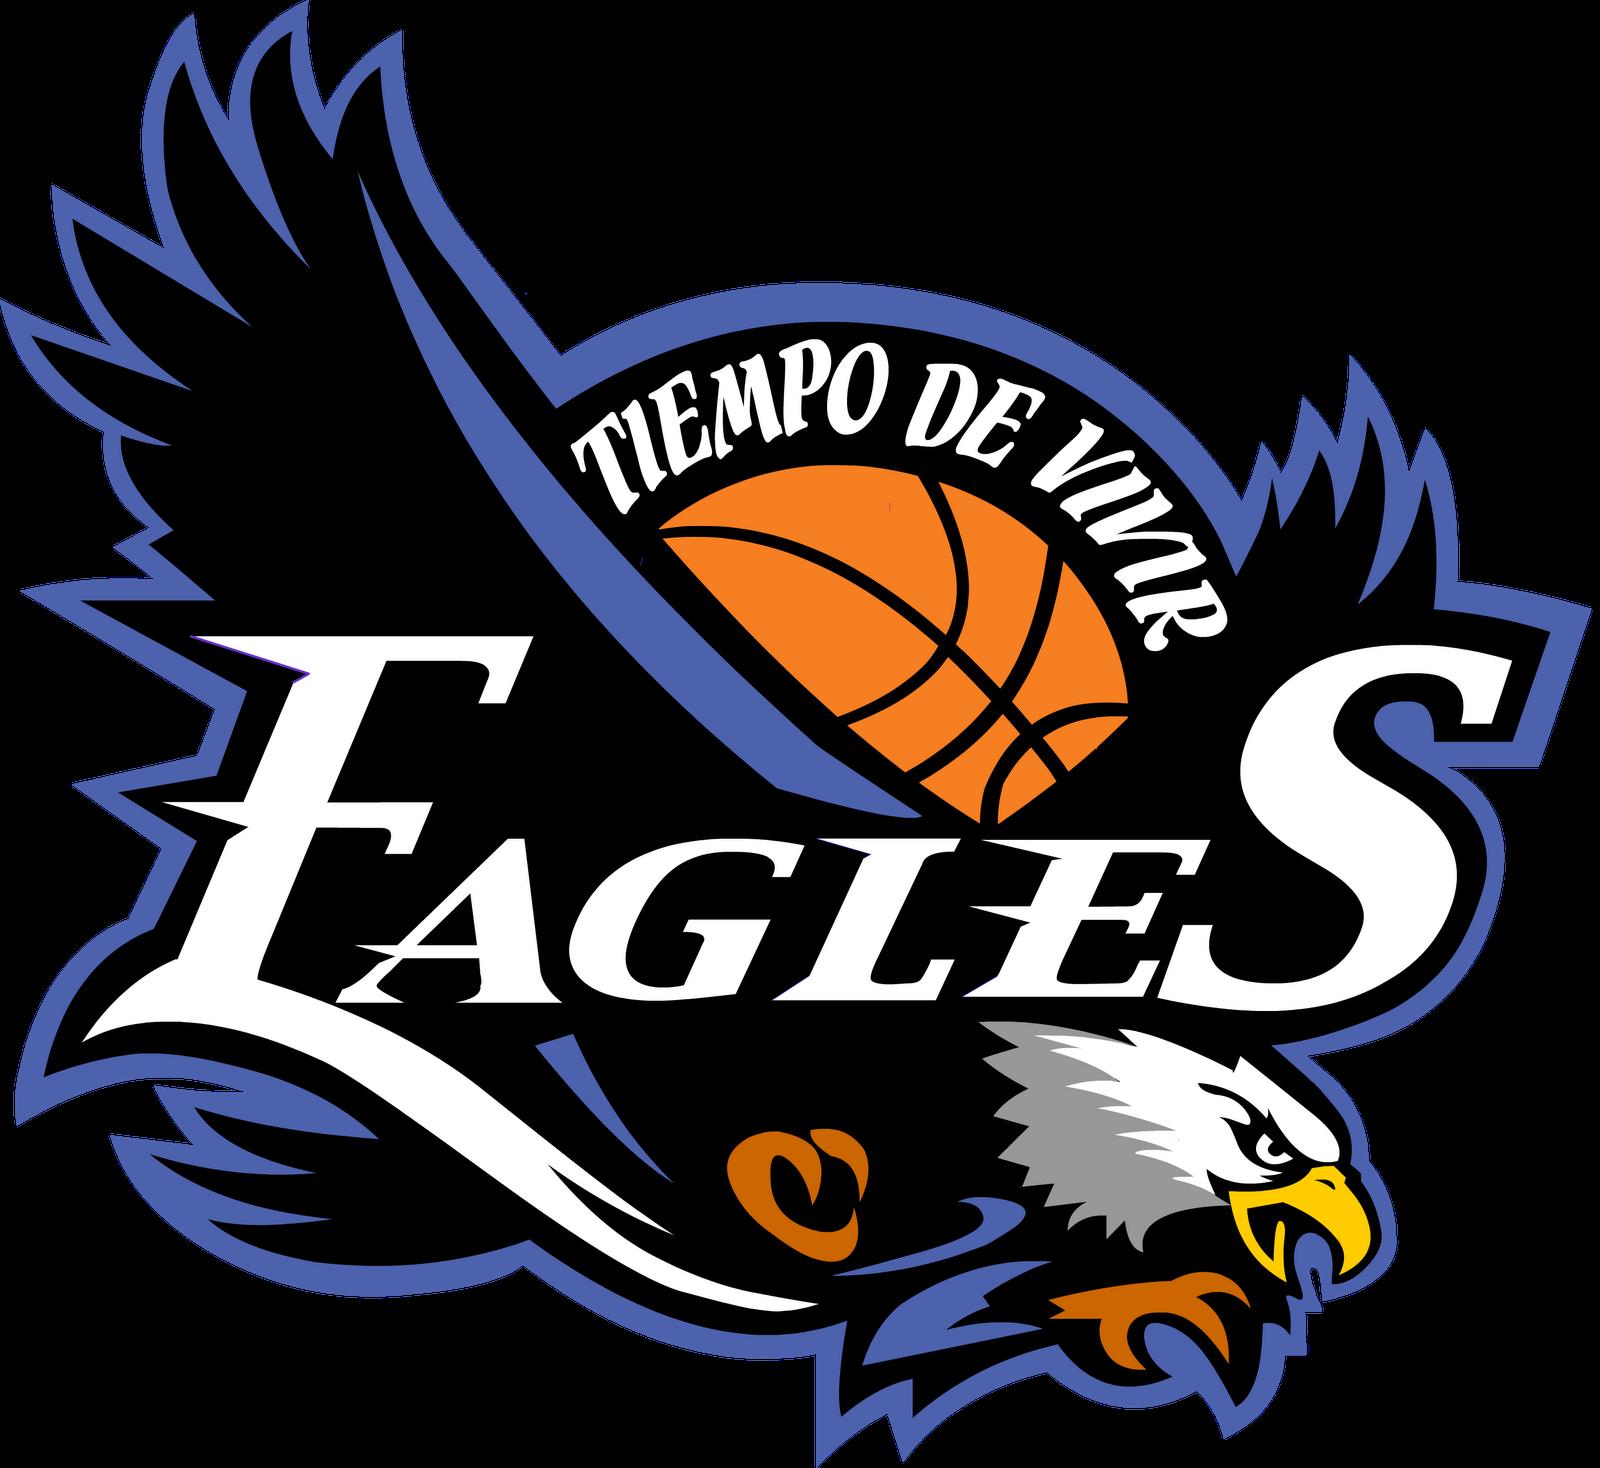 Tim logo clipart vector library library Eagles Basketball Team Logo Clipart | Sport Logos | Sports ... vector library library